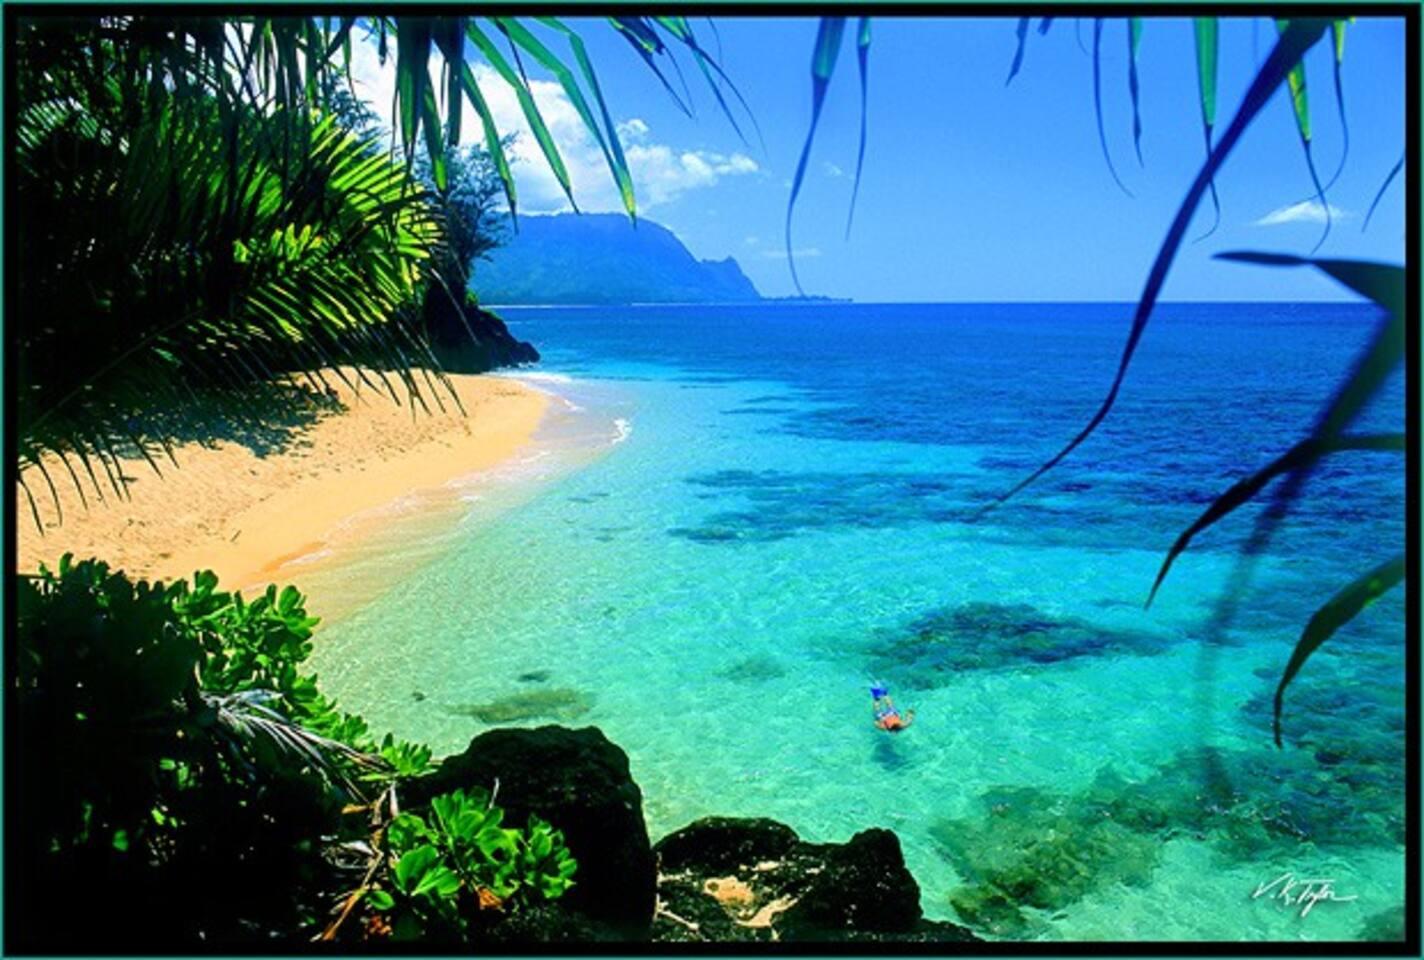 Hideaways beach is within walking distance